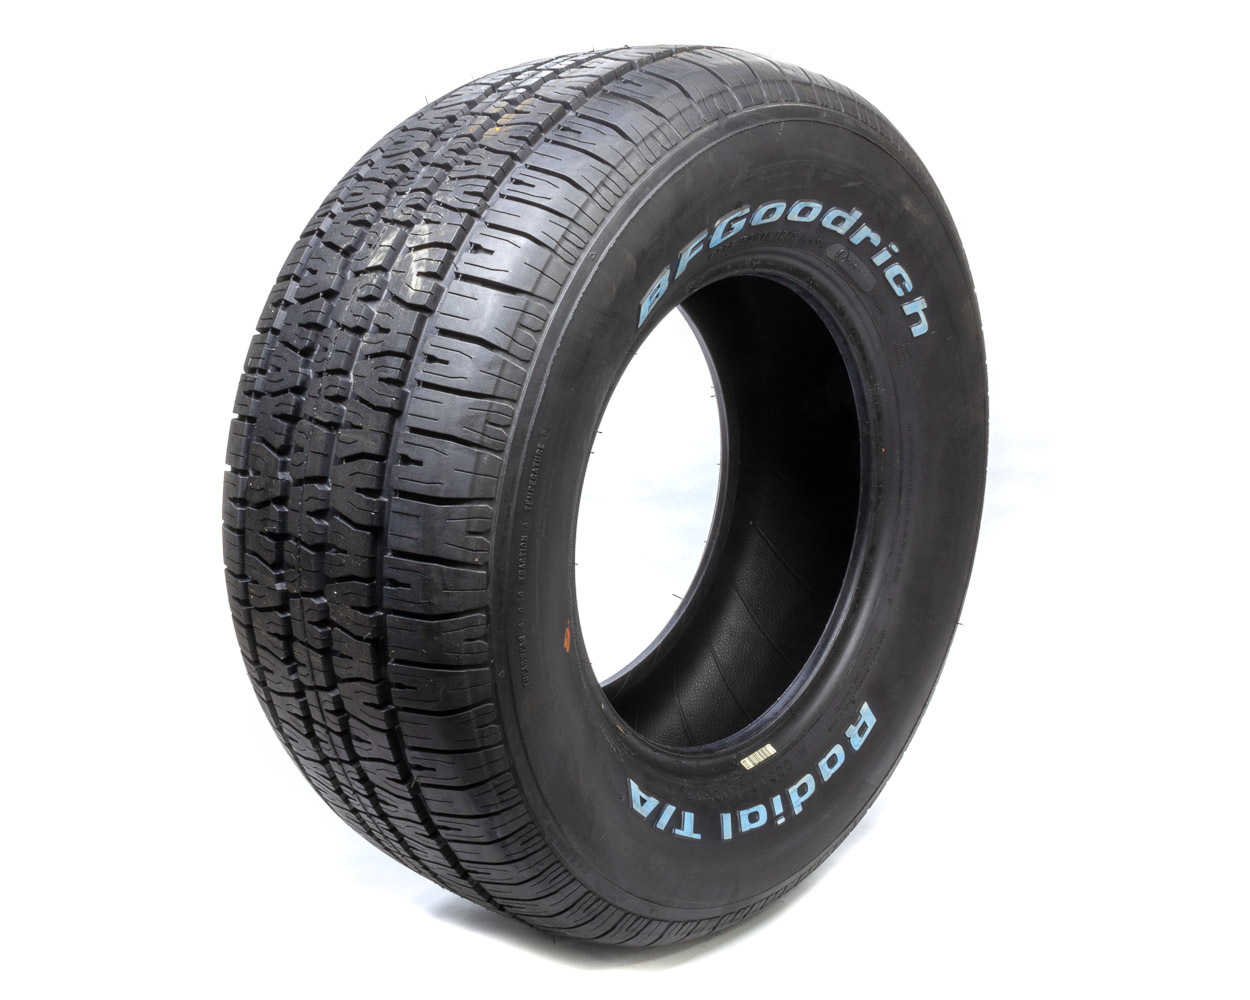 P275/60R15 BFG T/A RWL Tire